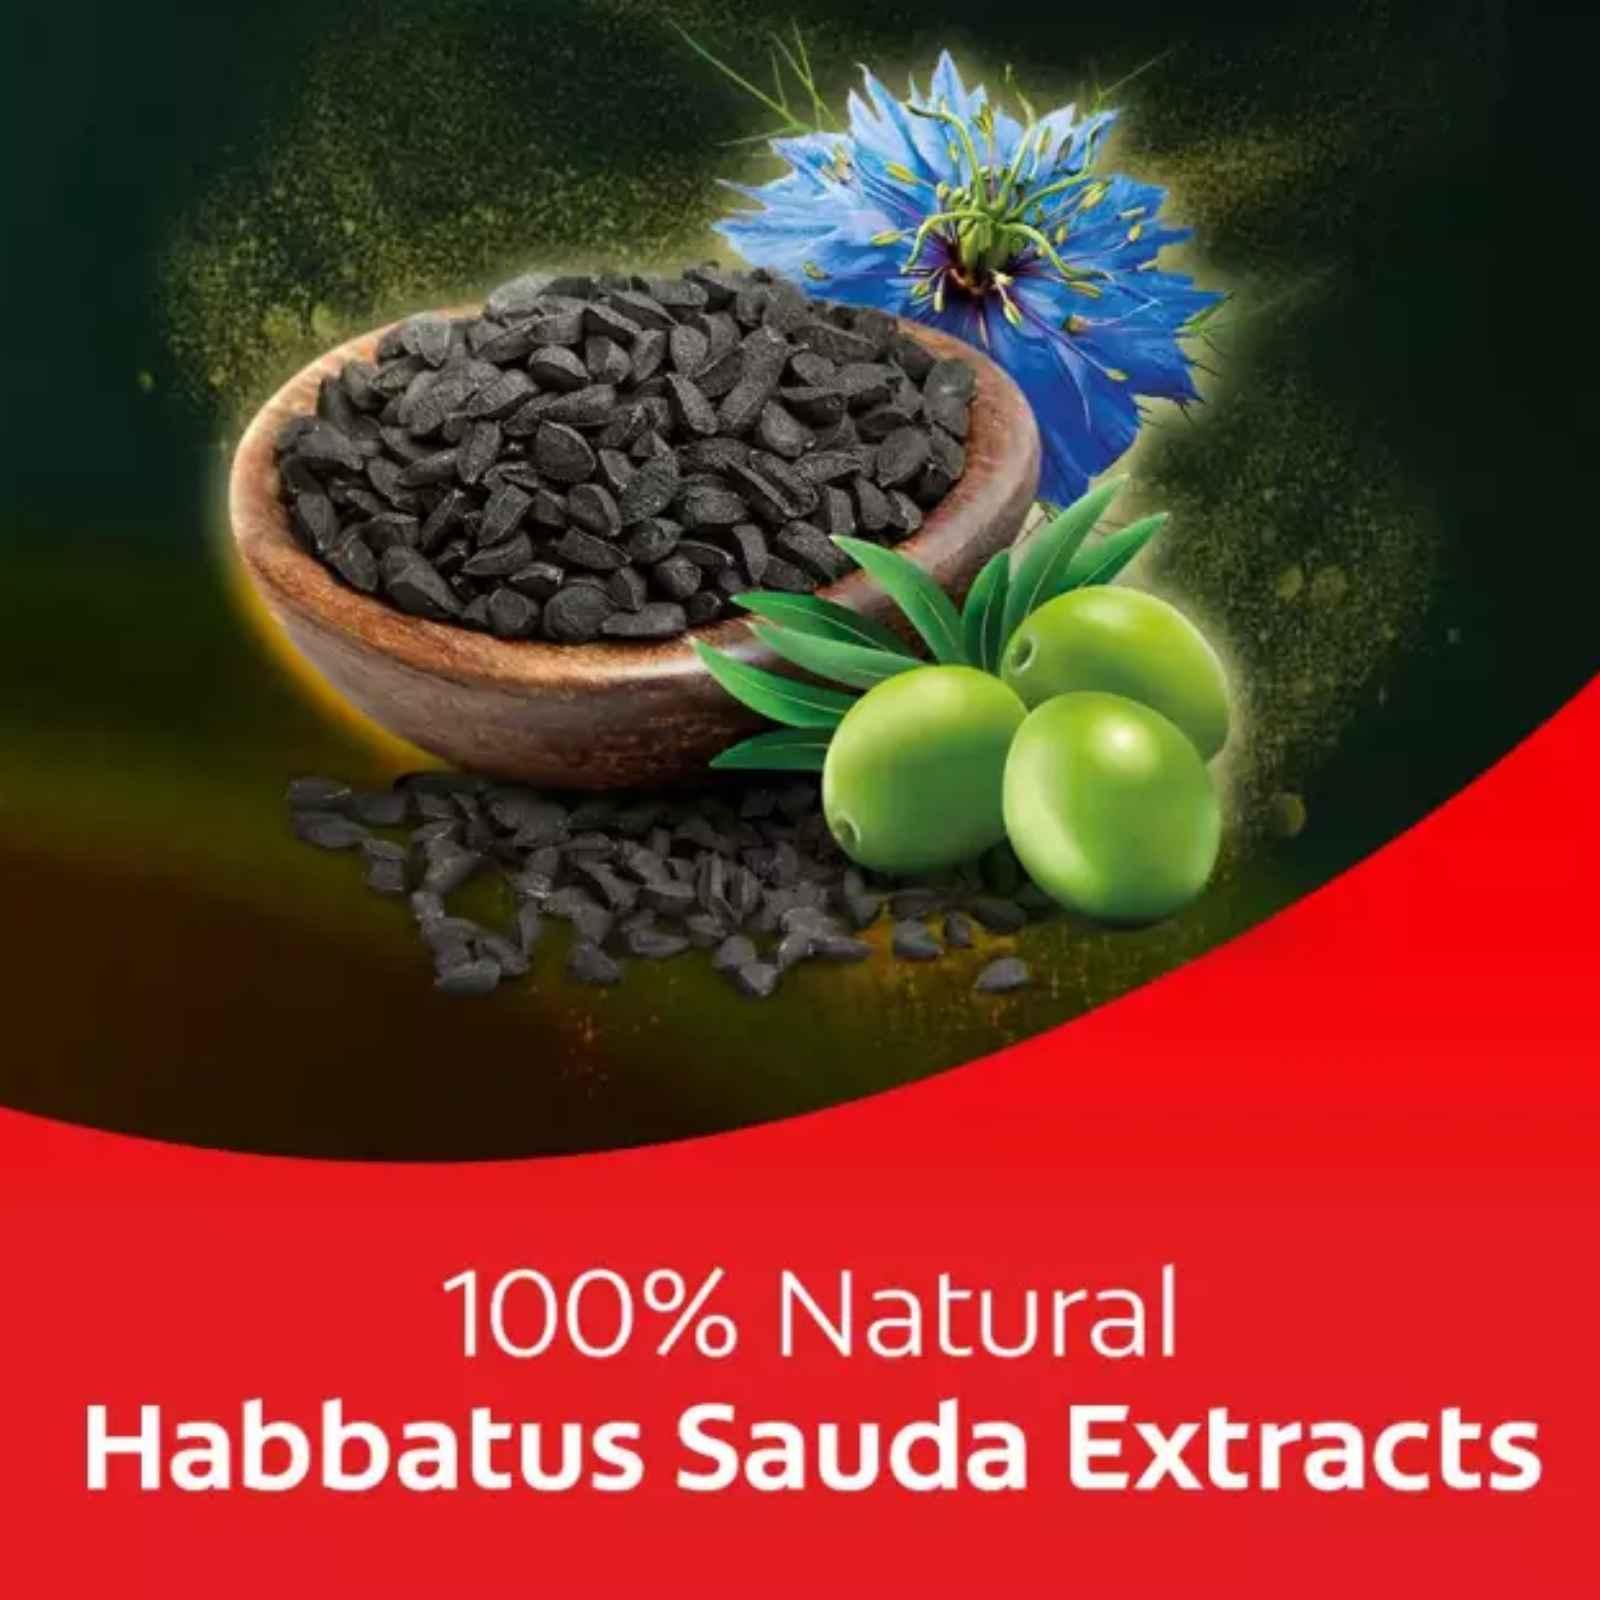 Colgate Habbatus Sauda Olive Toothpaste (120g)